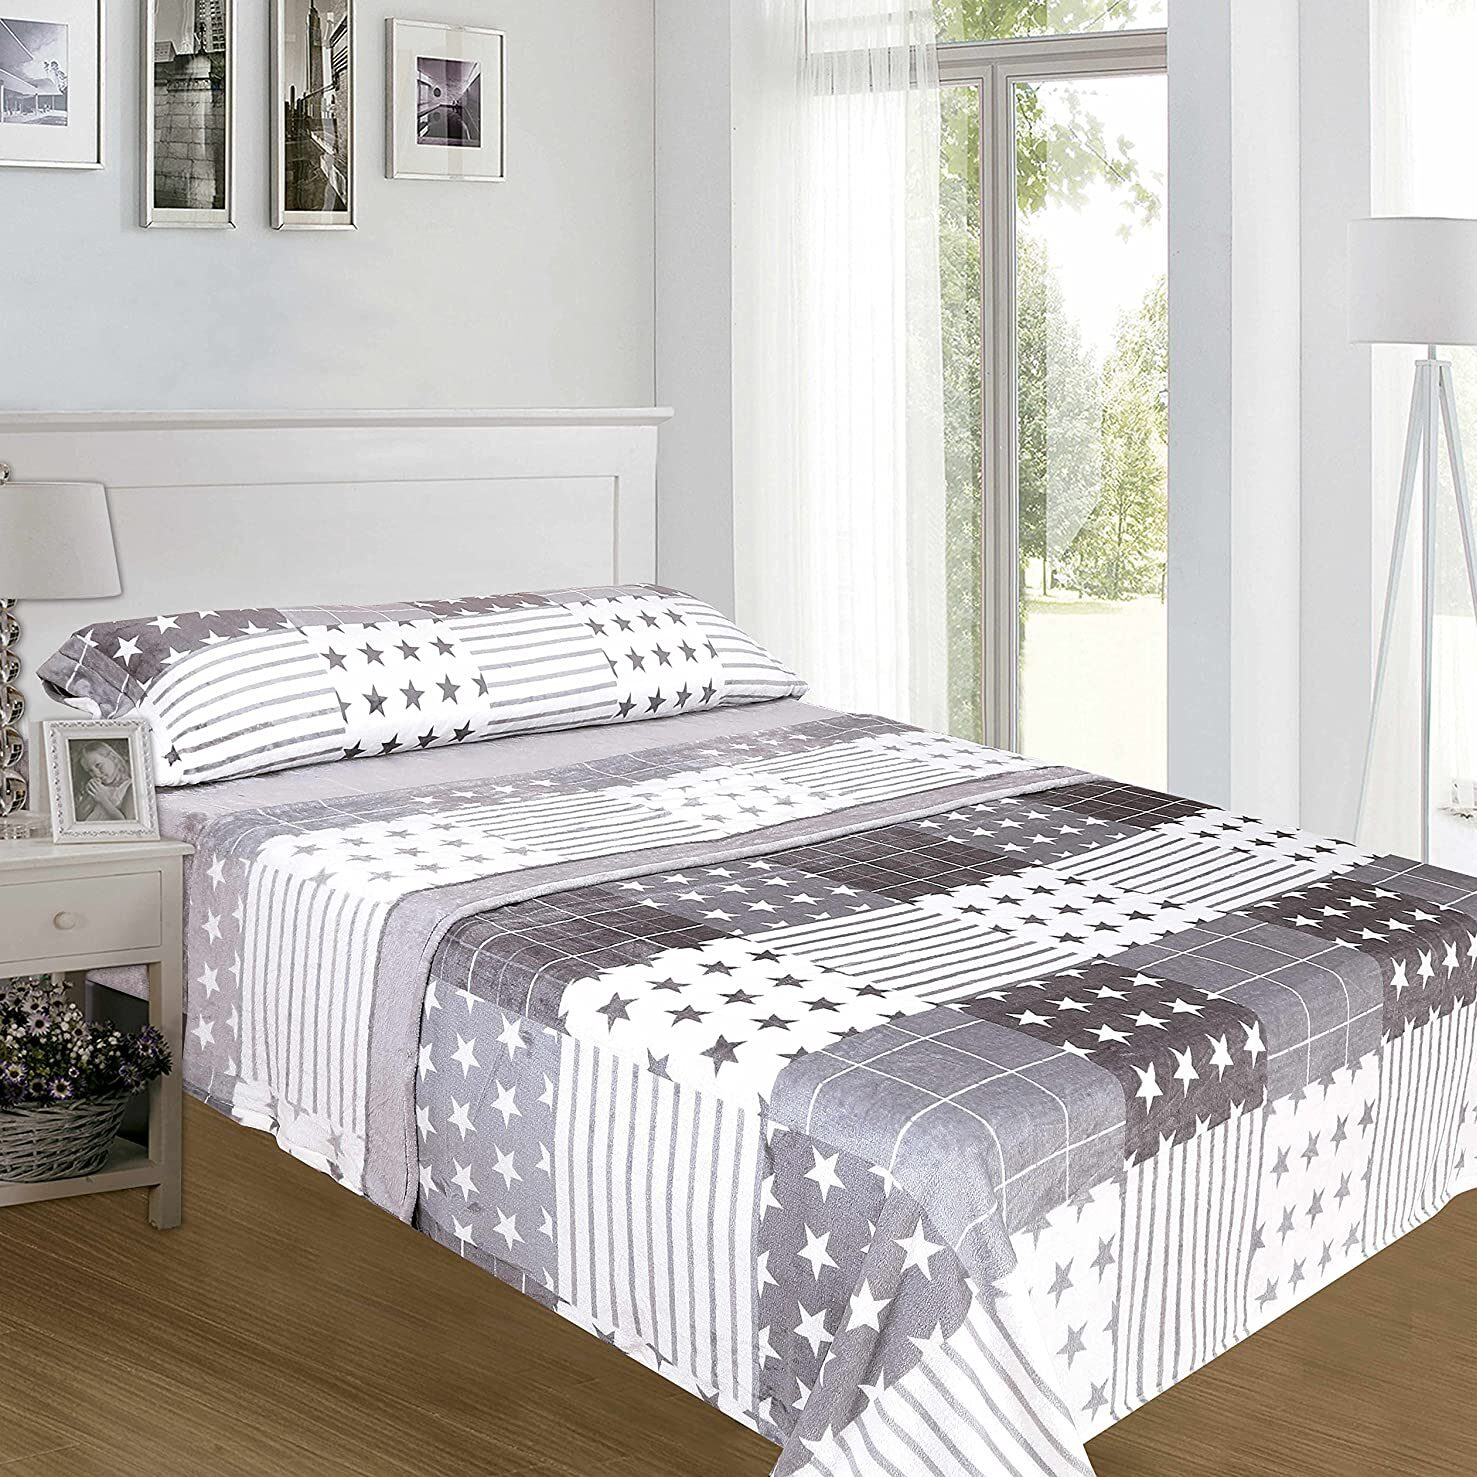 juego de sabanas sedalina para cama de 90 de 250g/m2